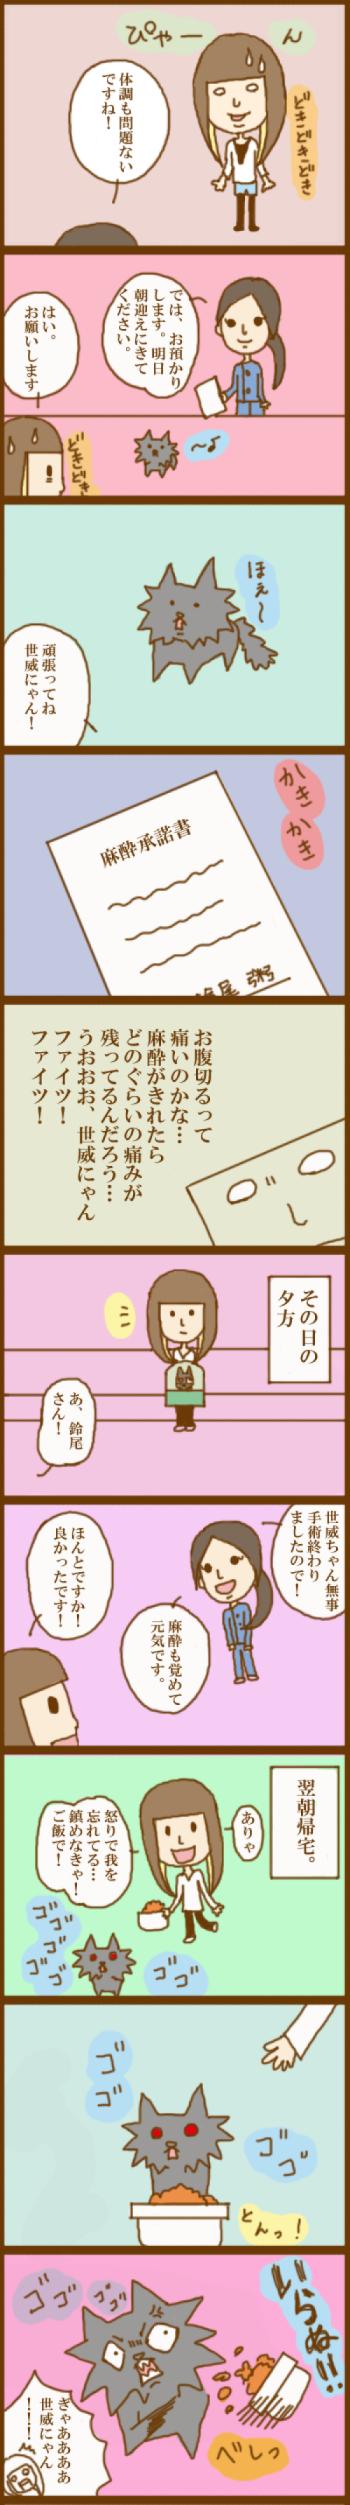 f:id:suzuokayu:20201115190144j:plain